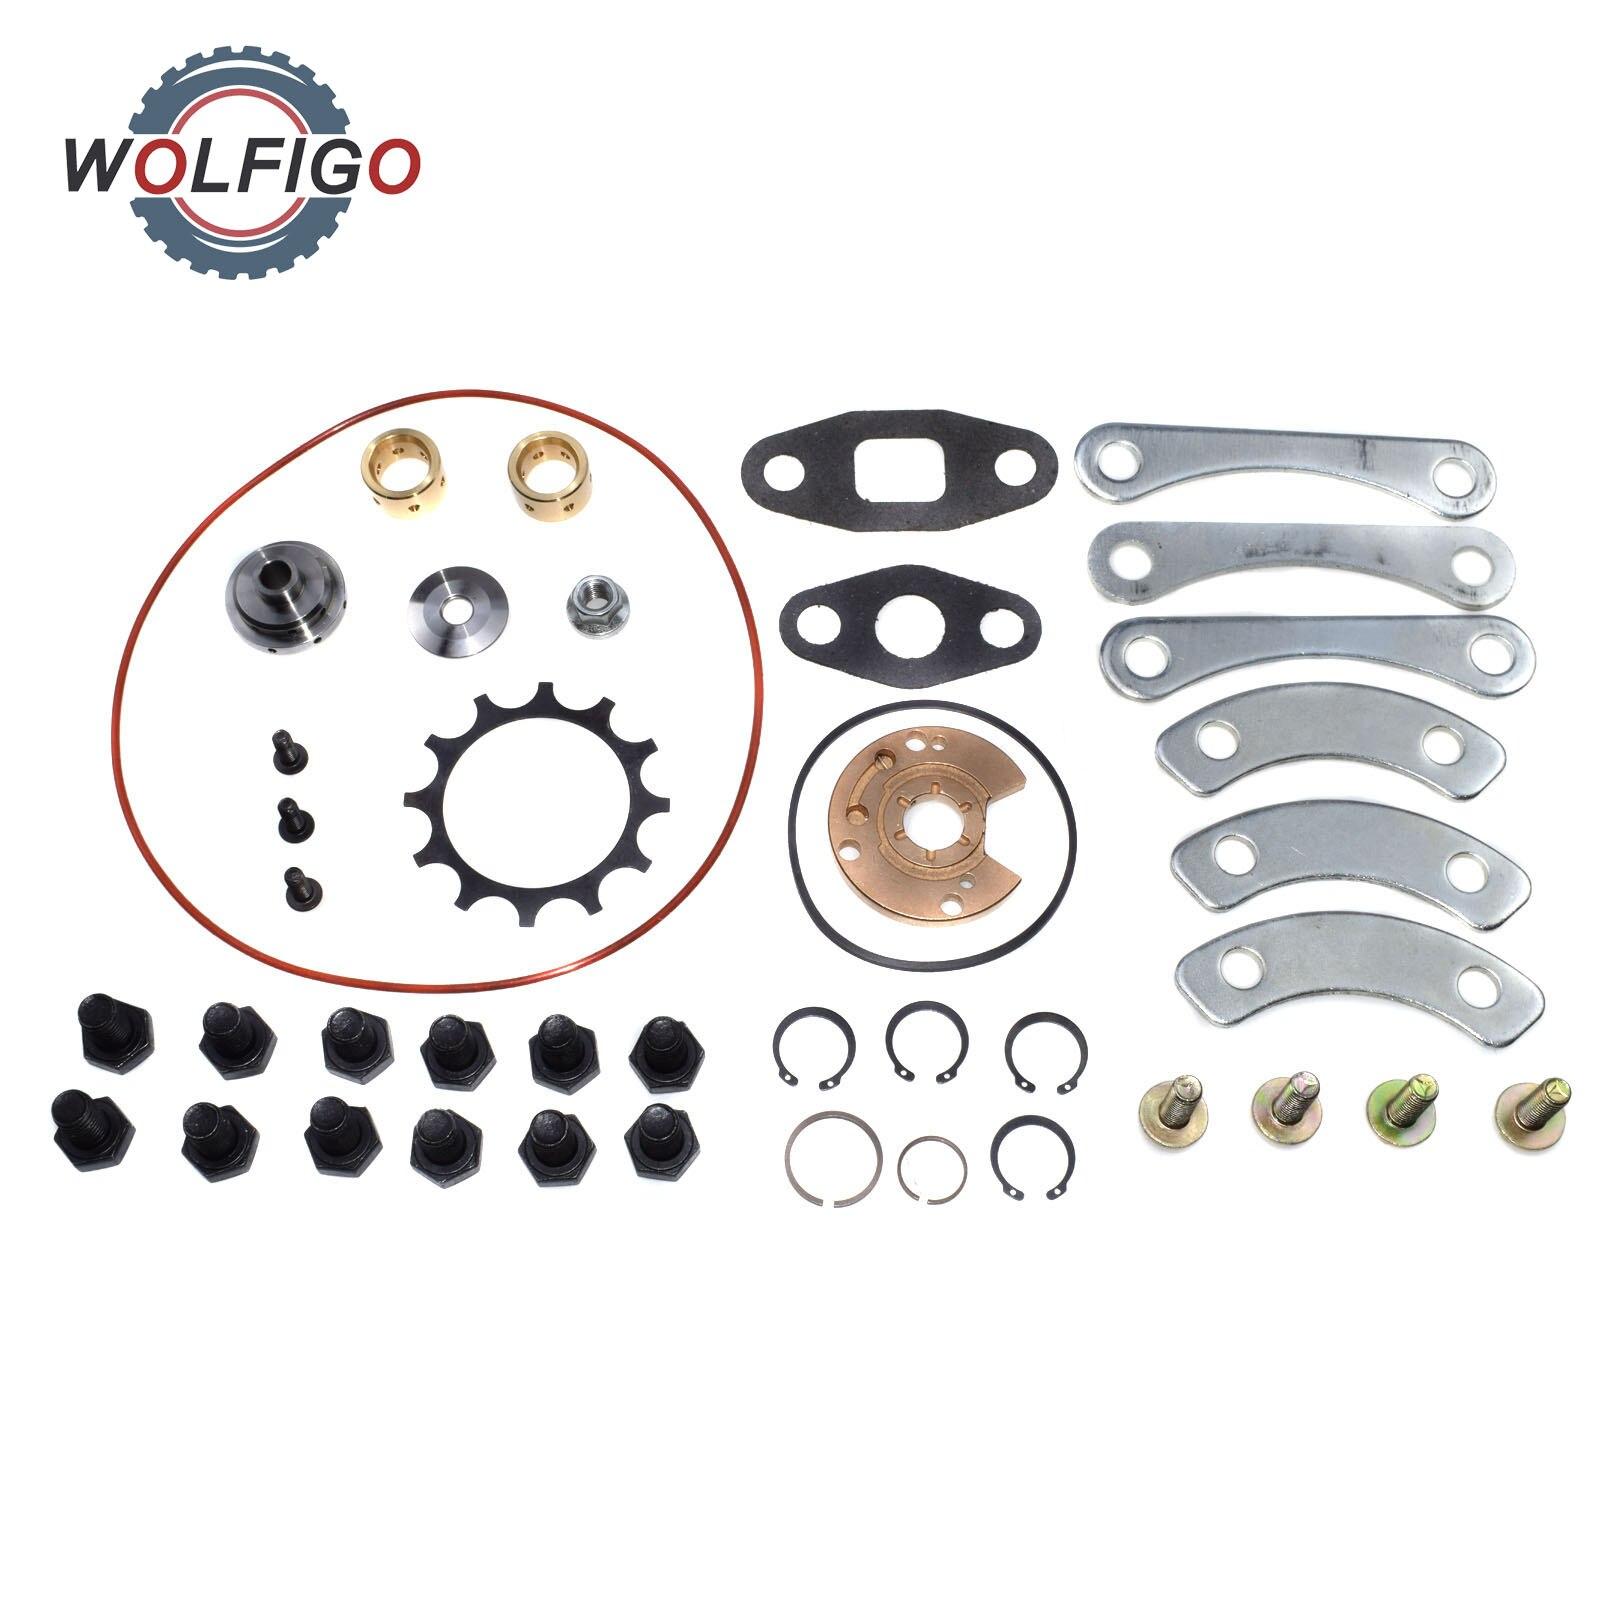 Precision T3 T4 360 Thrust Rebuild Kit: Aliexpress.com : Buy WOLFIGO New Turbo Charger Repair